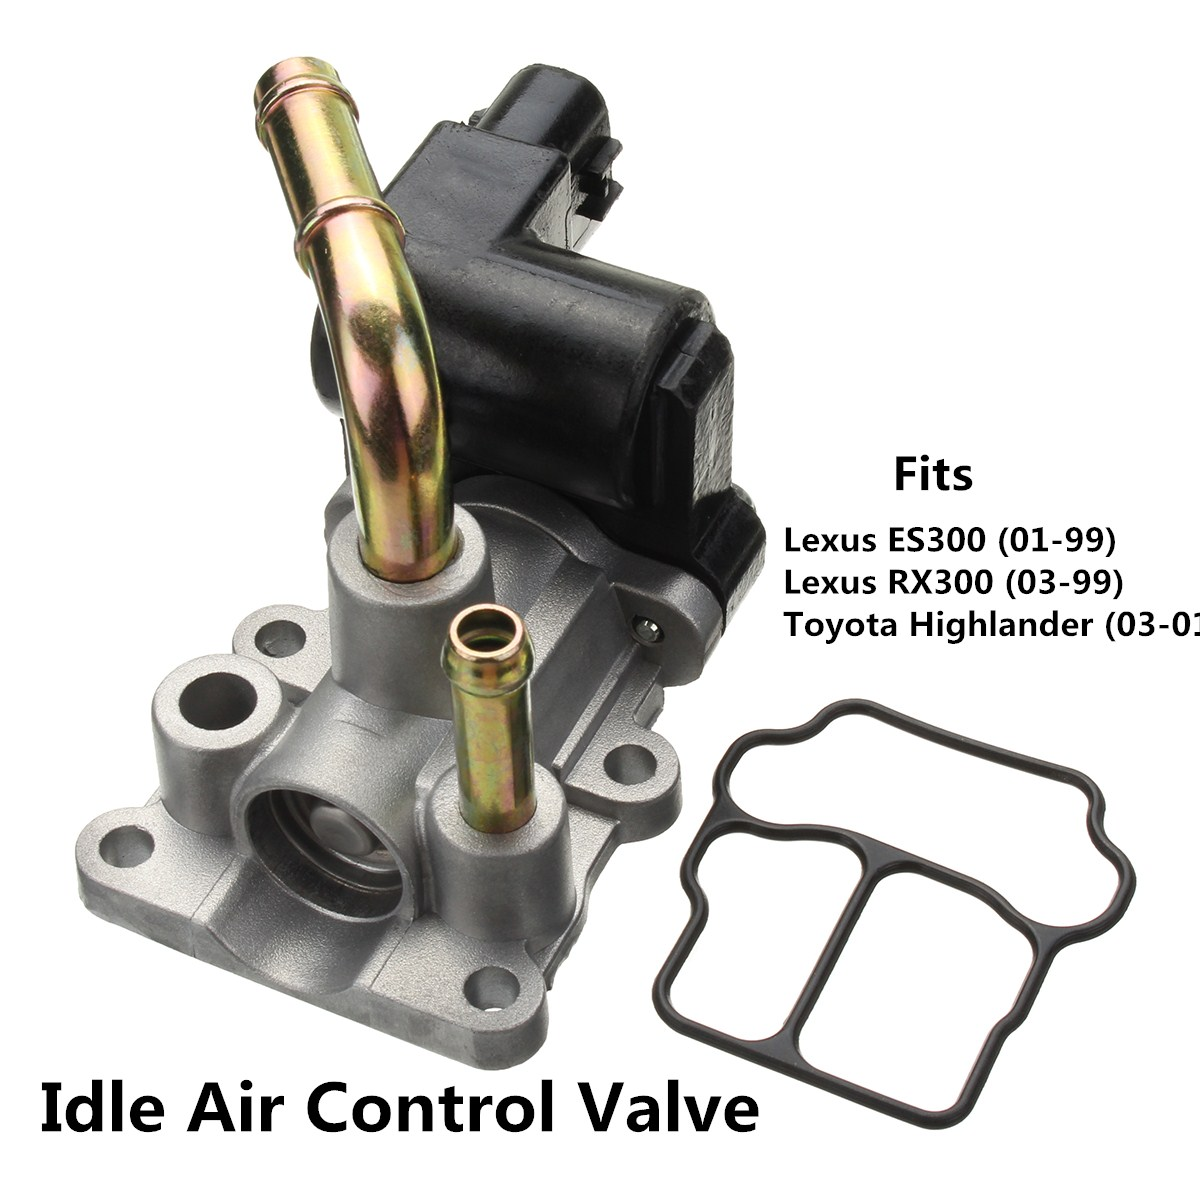 Car Idle Air Control Valve 2227020050 For Lexus ES300